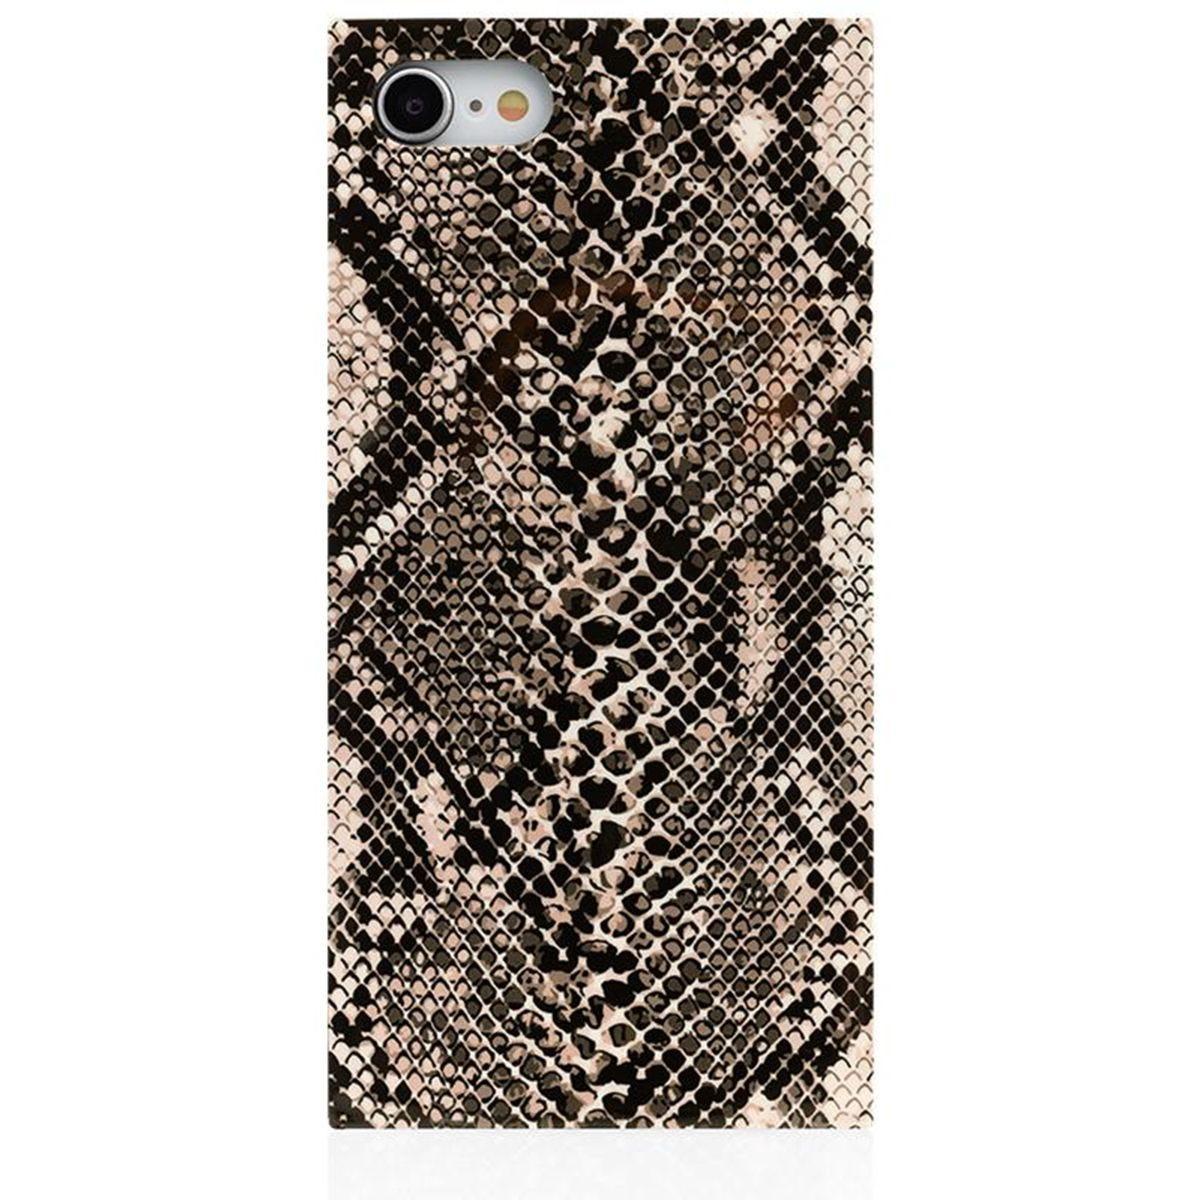 iDecoz Python Phone Case iPhone 7/8+